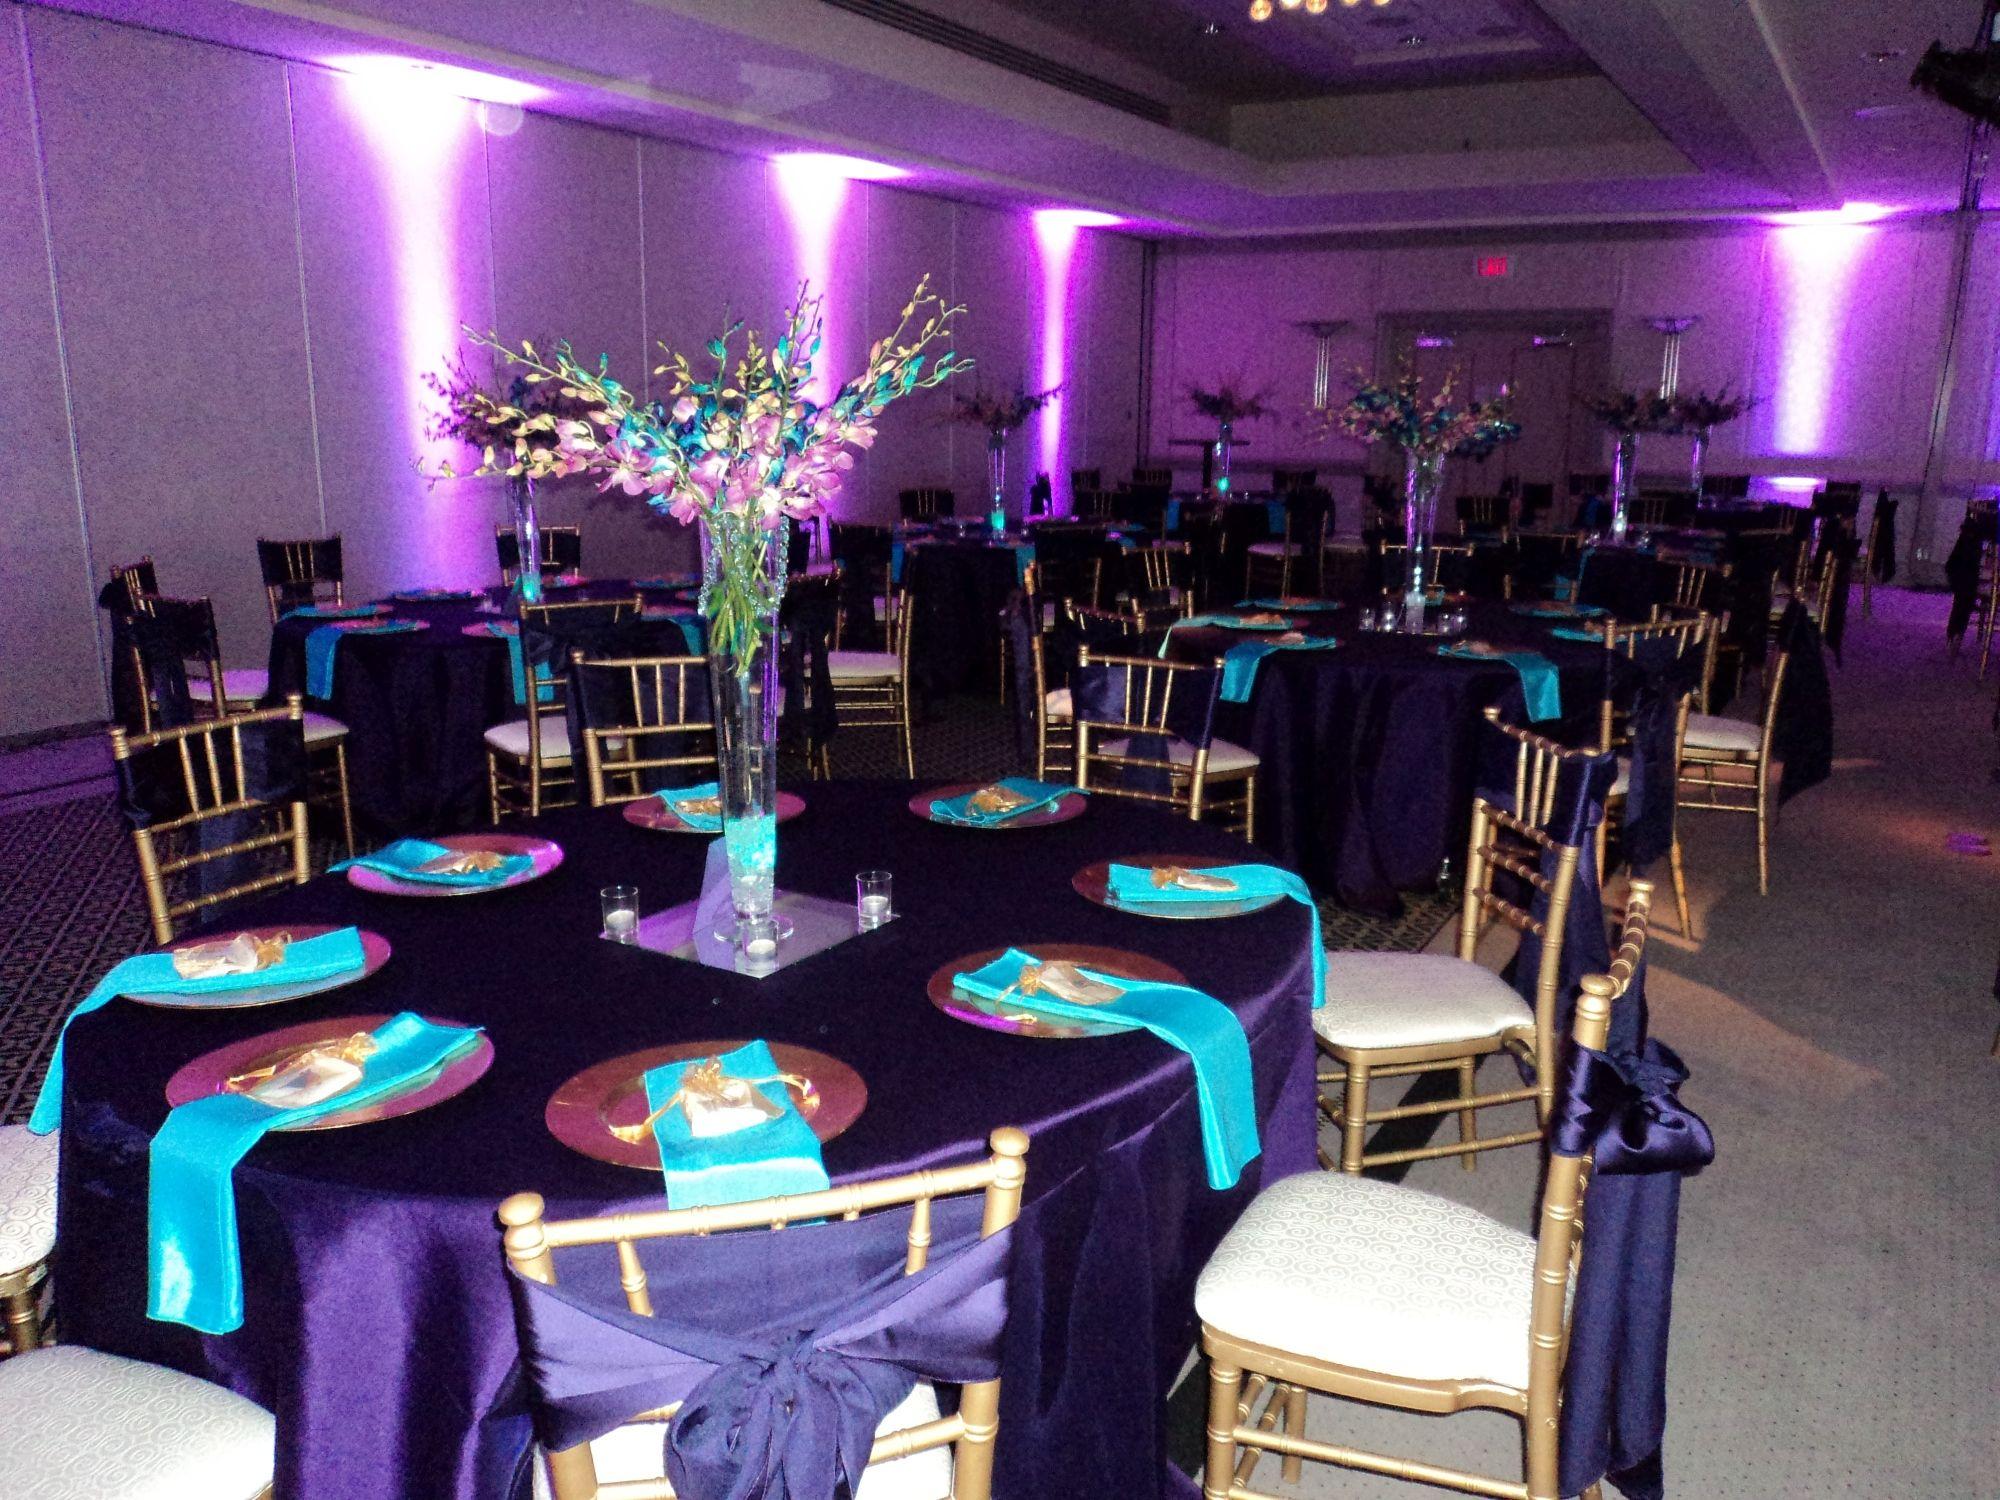 Purple Teal Gold 2 Silva Designs Wedding Decor Rentals